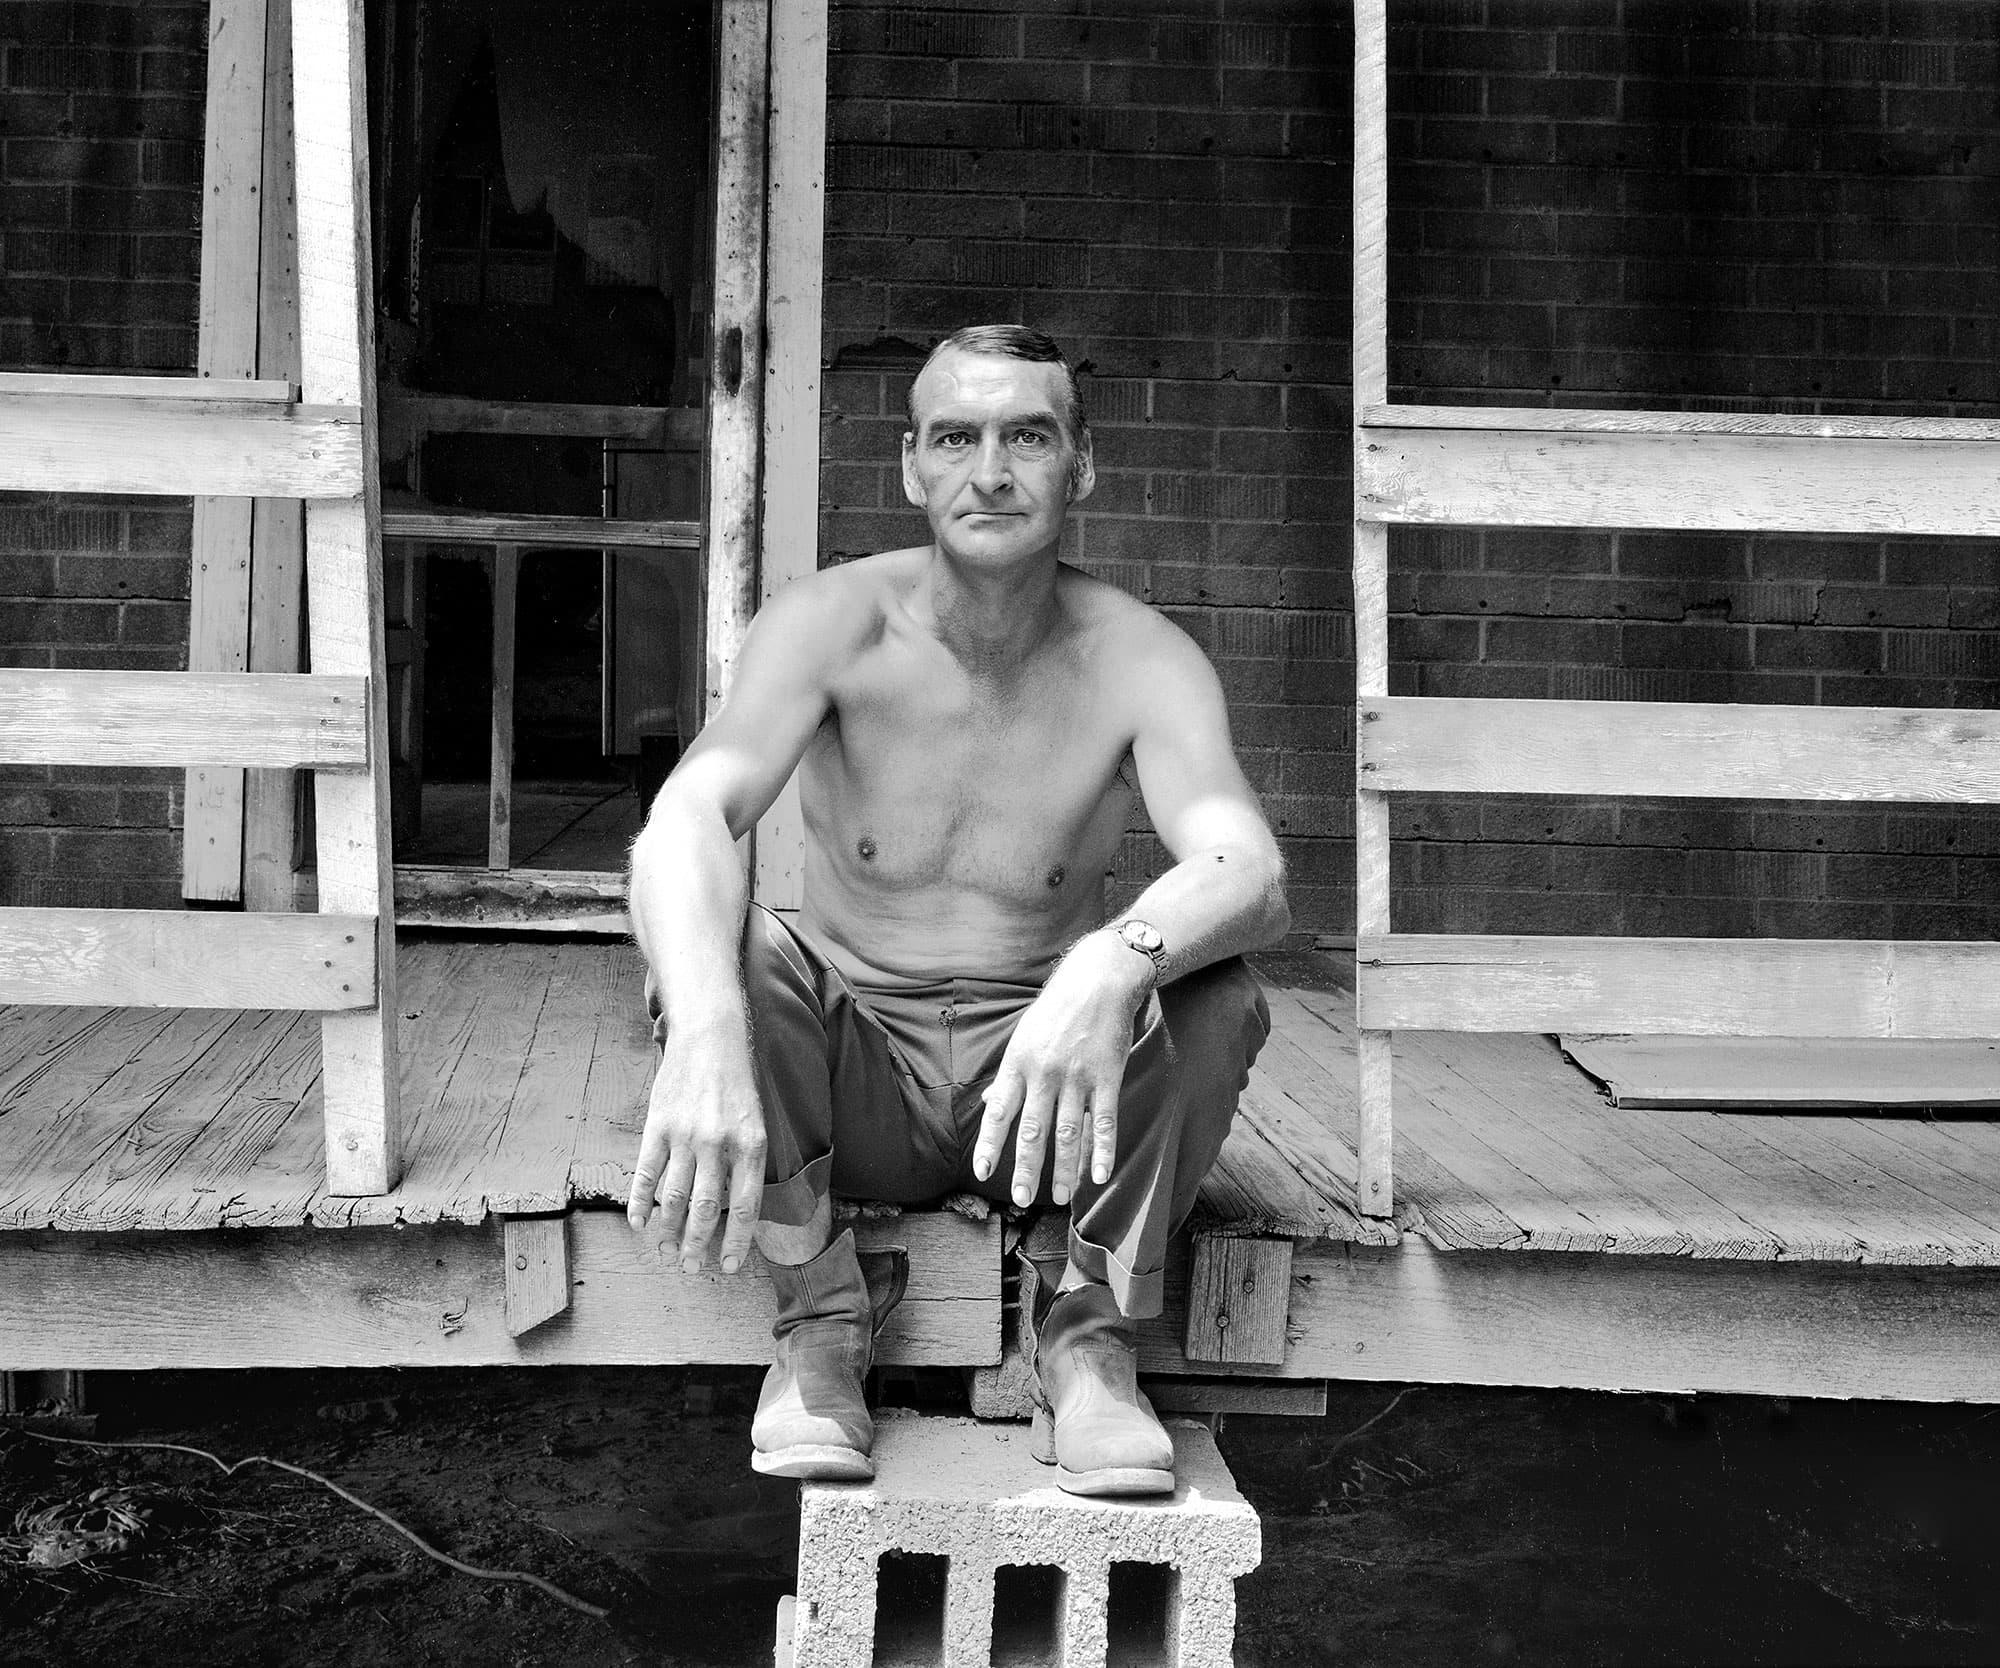 arthur-lazar-Roosevelt-Preston-Kentucky-1976